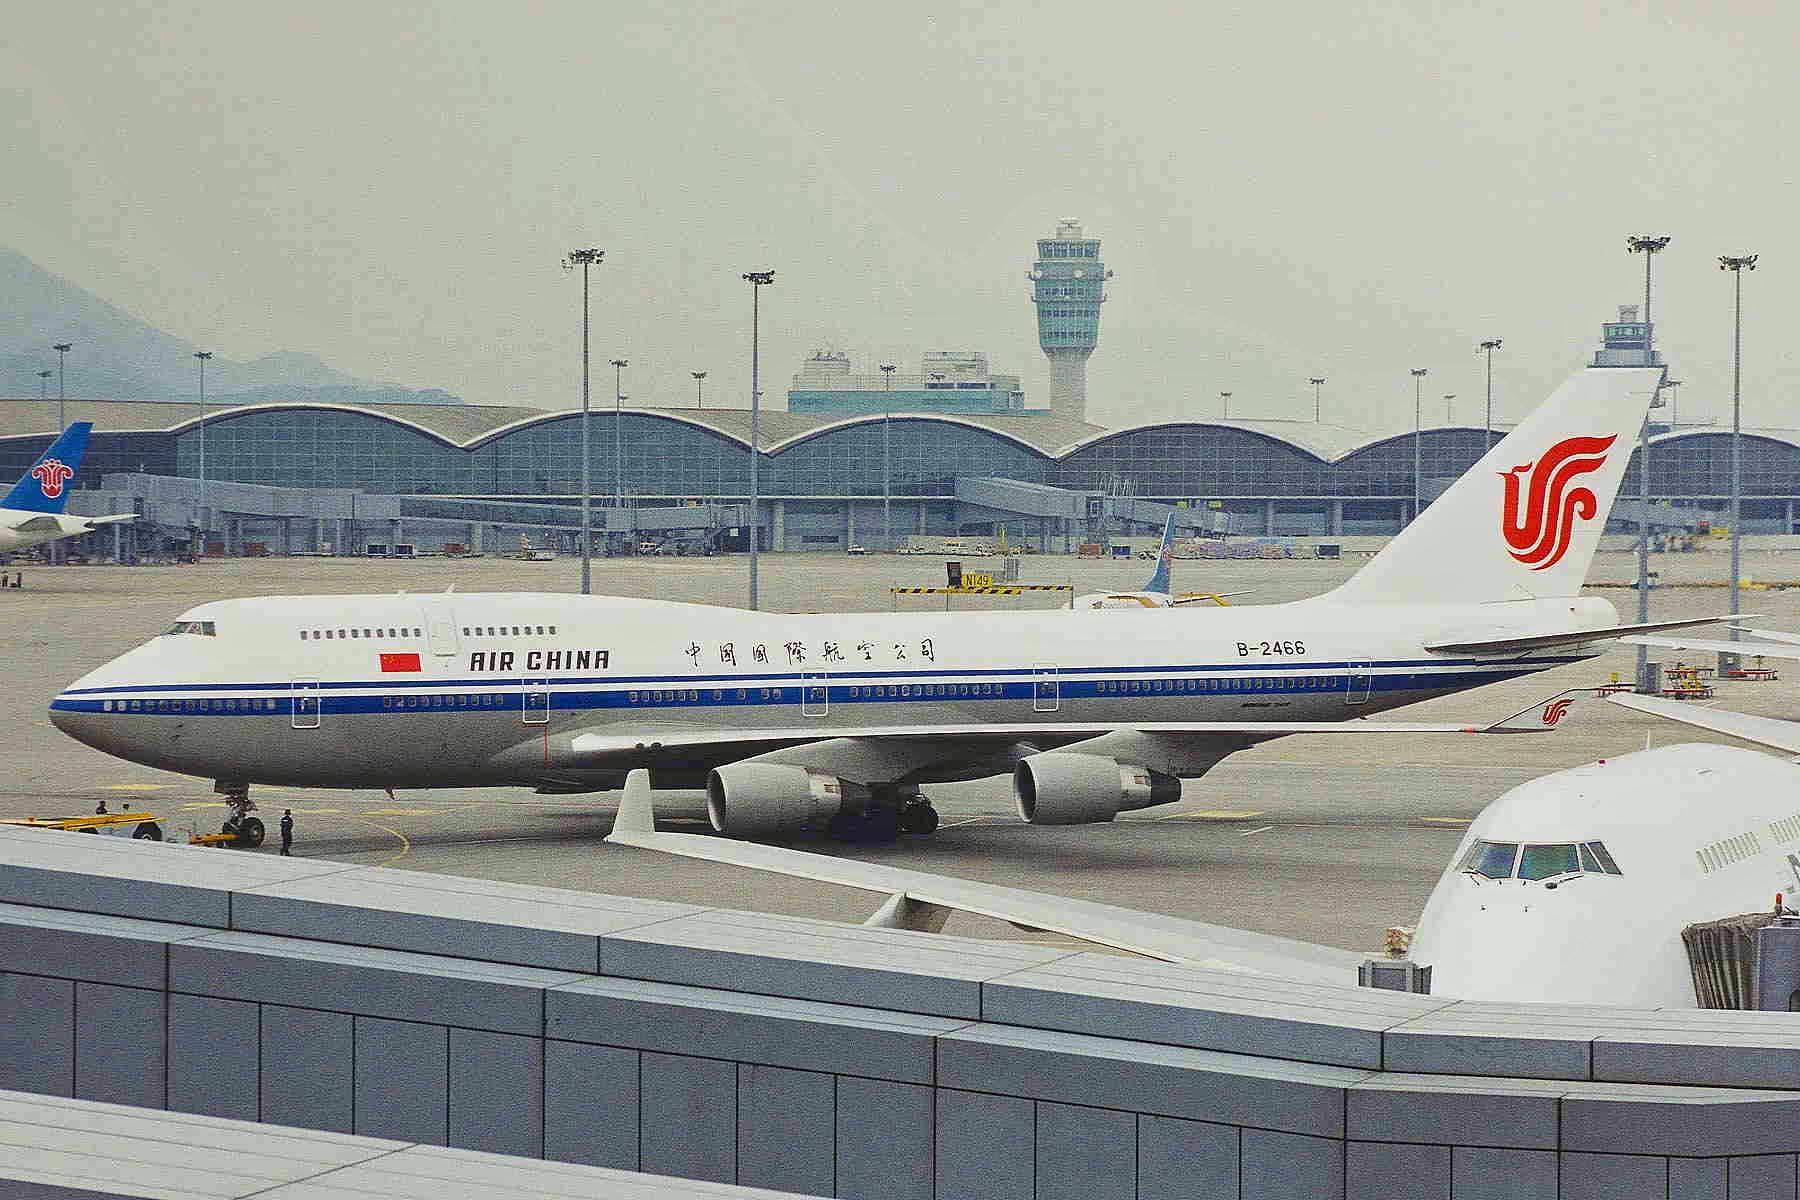 File:B-2466 B747-4J6 Air China HKG 01OCT99 (6516624773).